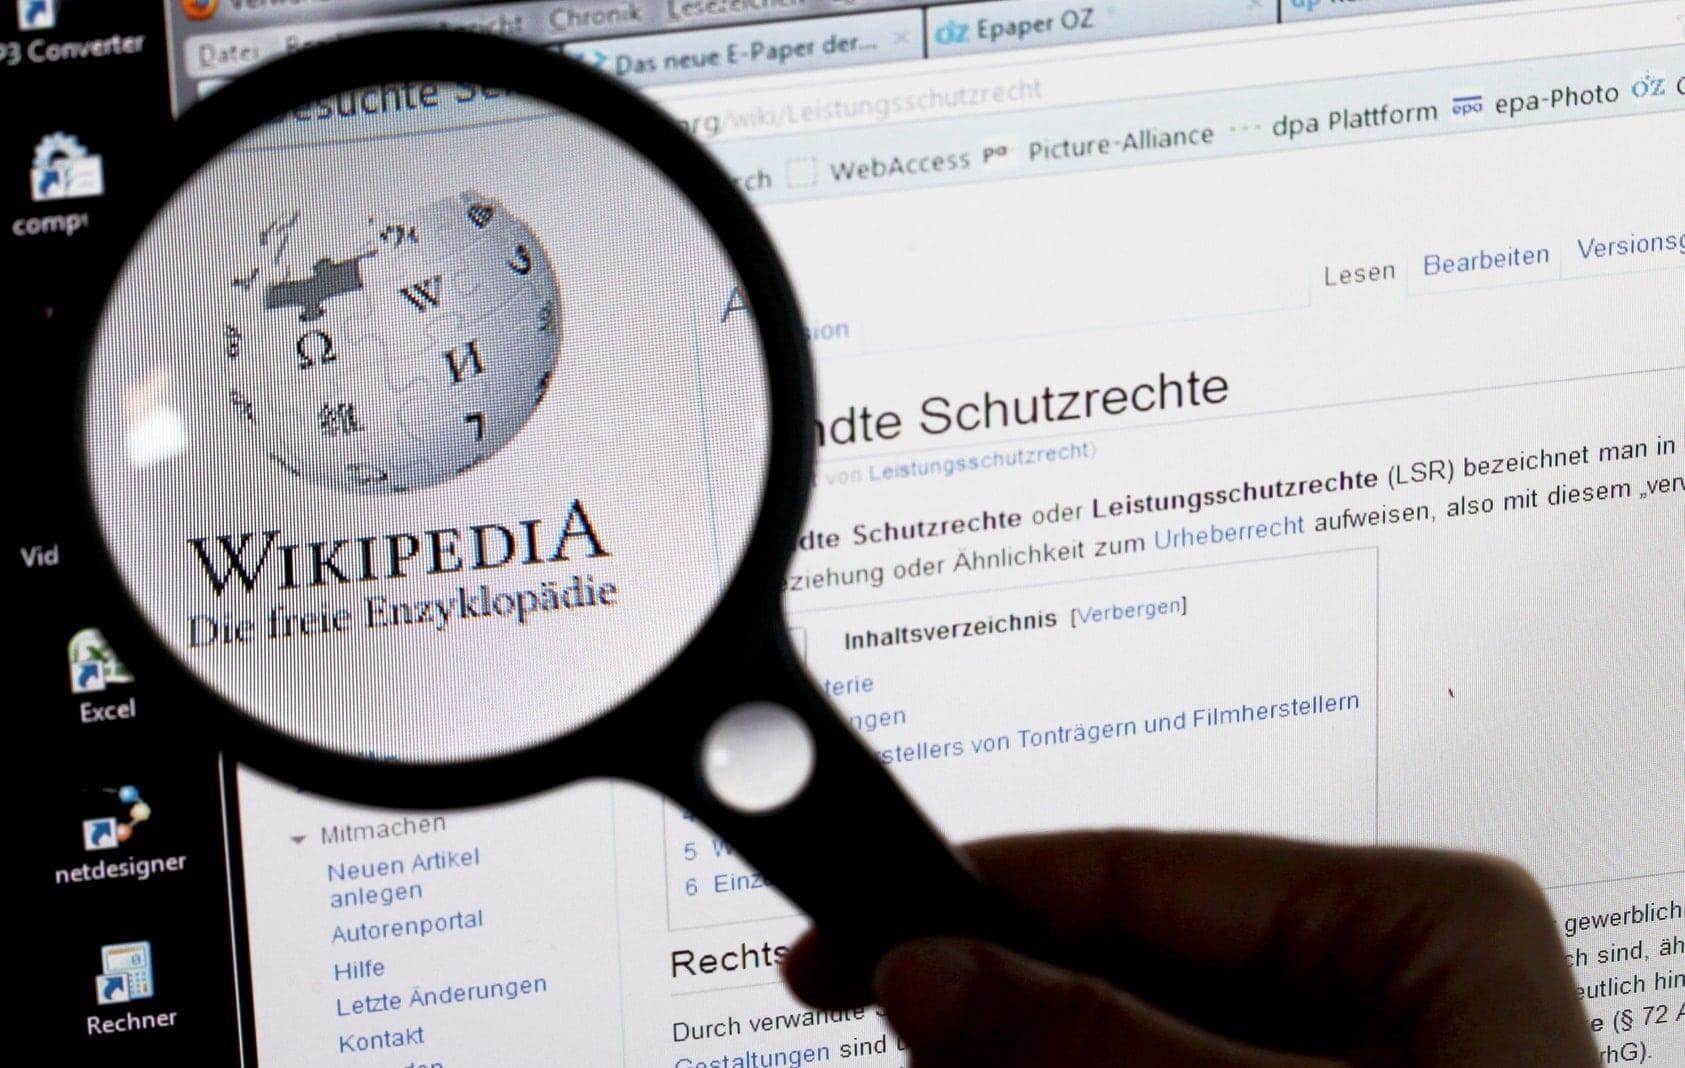 Massiver Online-Angriff legt Wikipedia stundenlang lahm